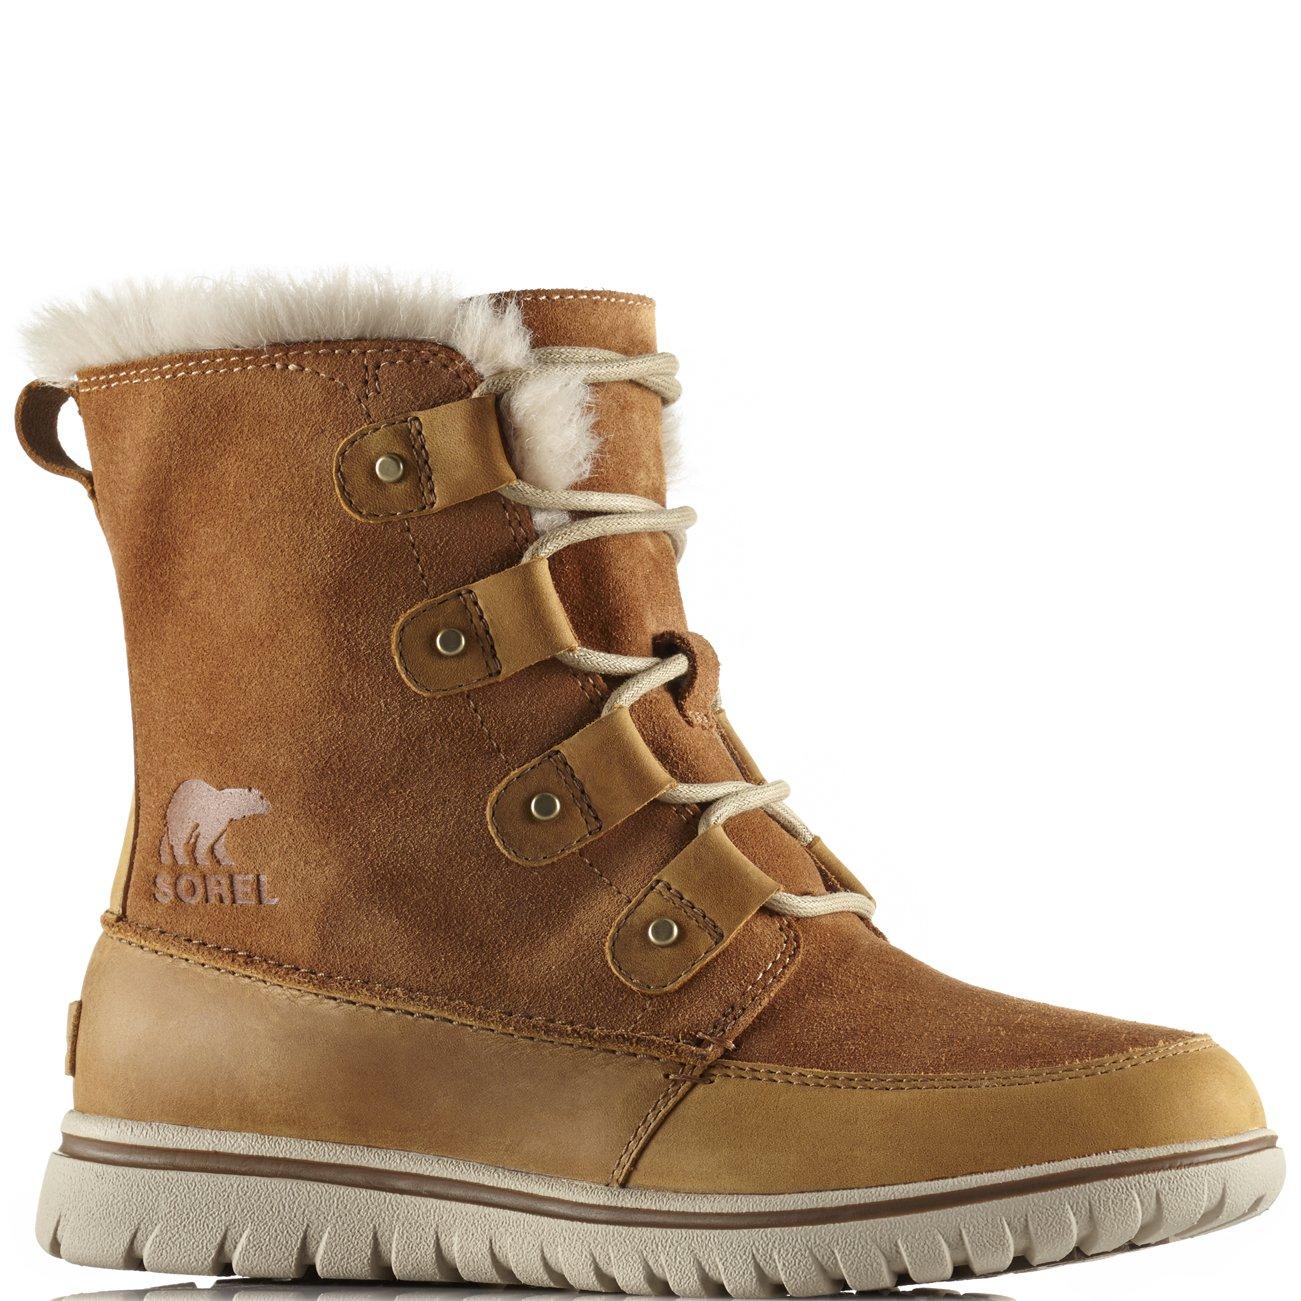 SOREL Women's Cozy Joan Non Shell Boot, Size: 11 B(M) US, Color Elk